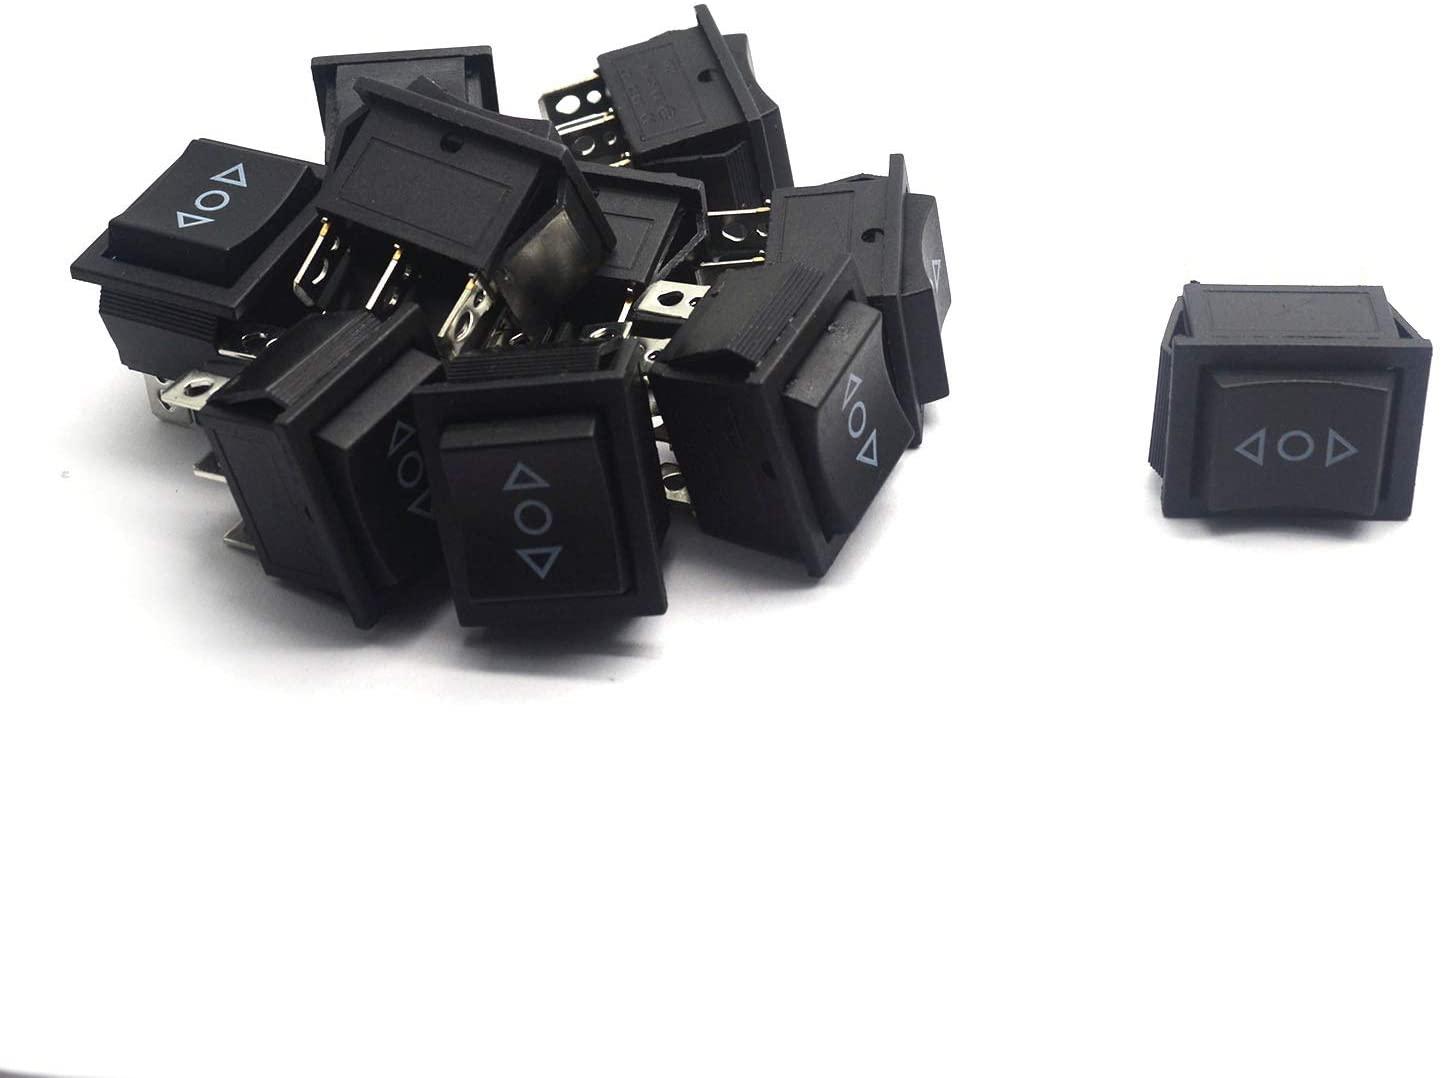 Karcy 3 Position 6 Pin Boat Rocker Switch ON/Off/ON DPST 16A/250V AC Rocker Power Switch Black 20A/125V AC Pack of 10